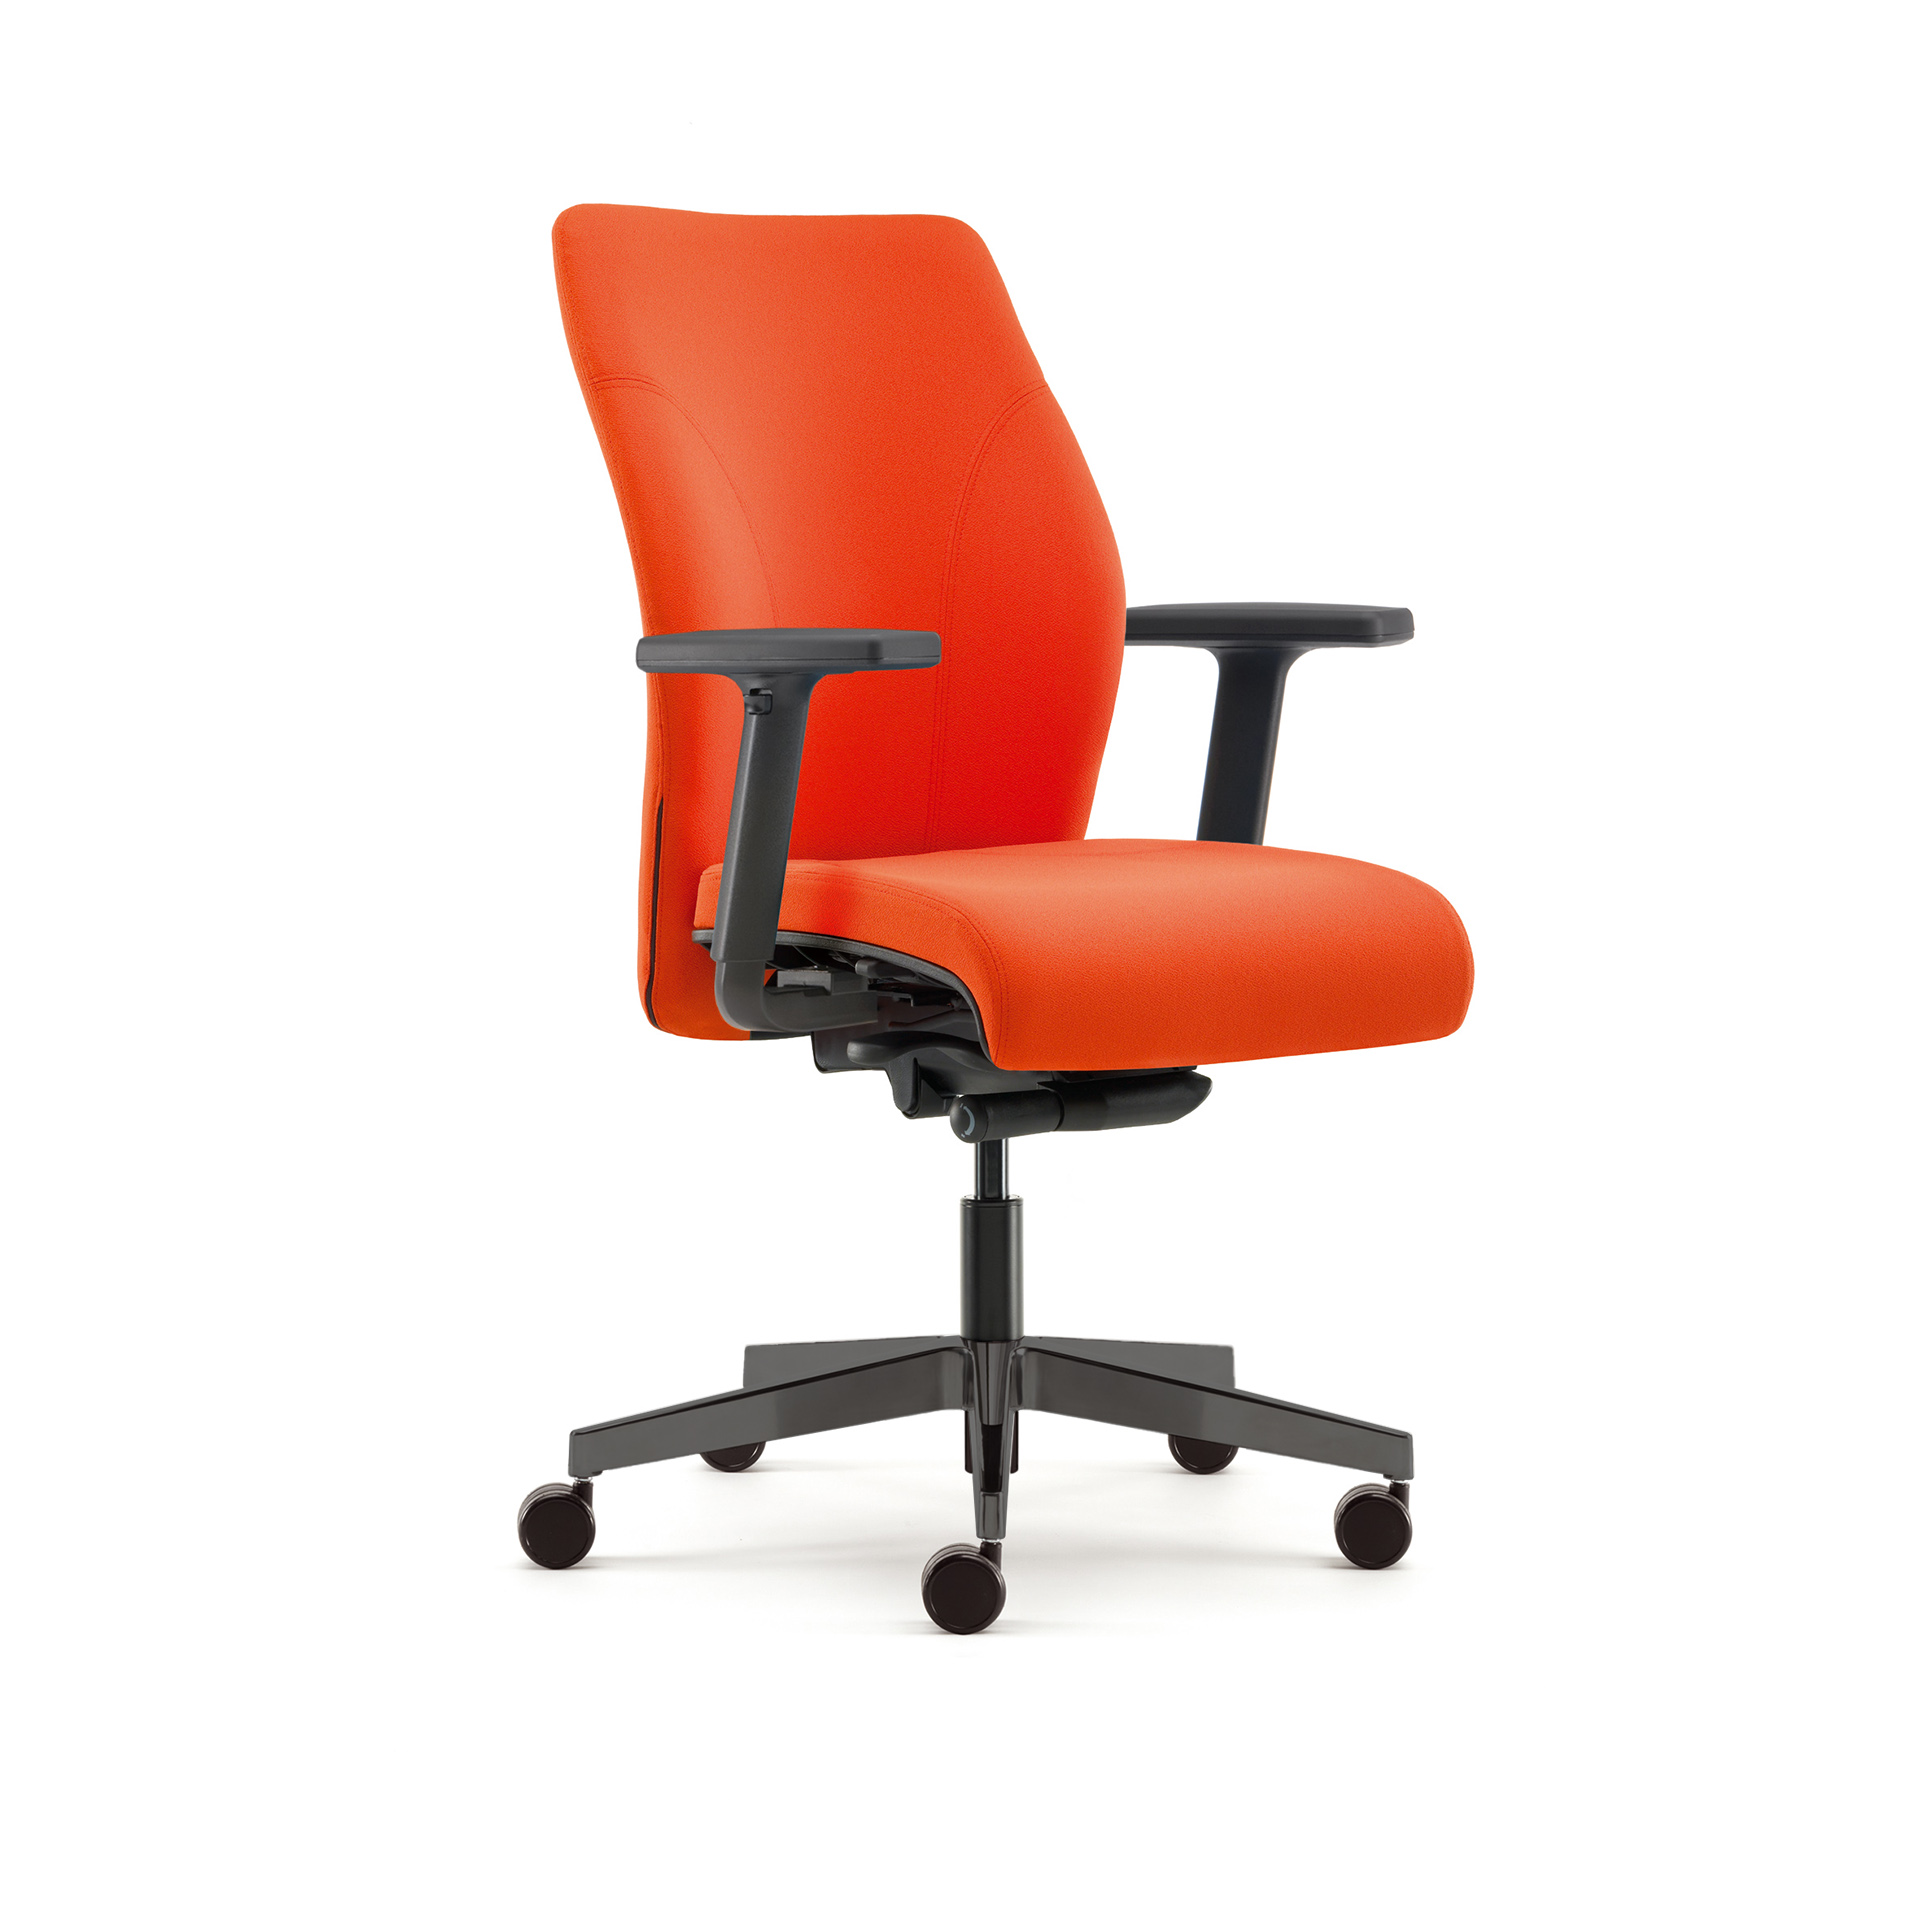 Medium Back Task Chair